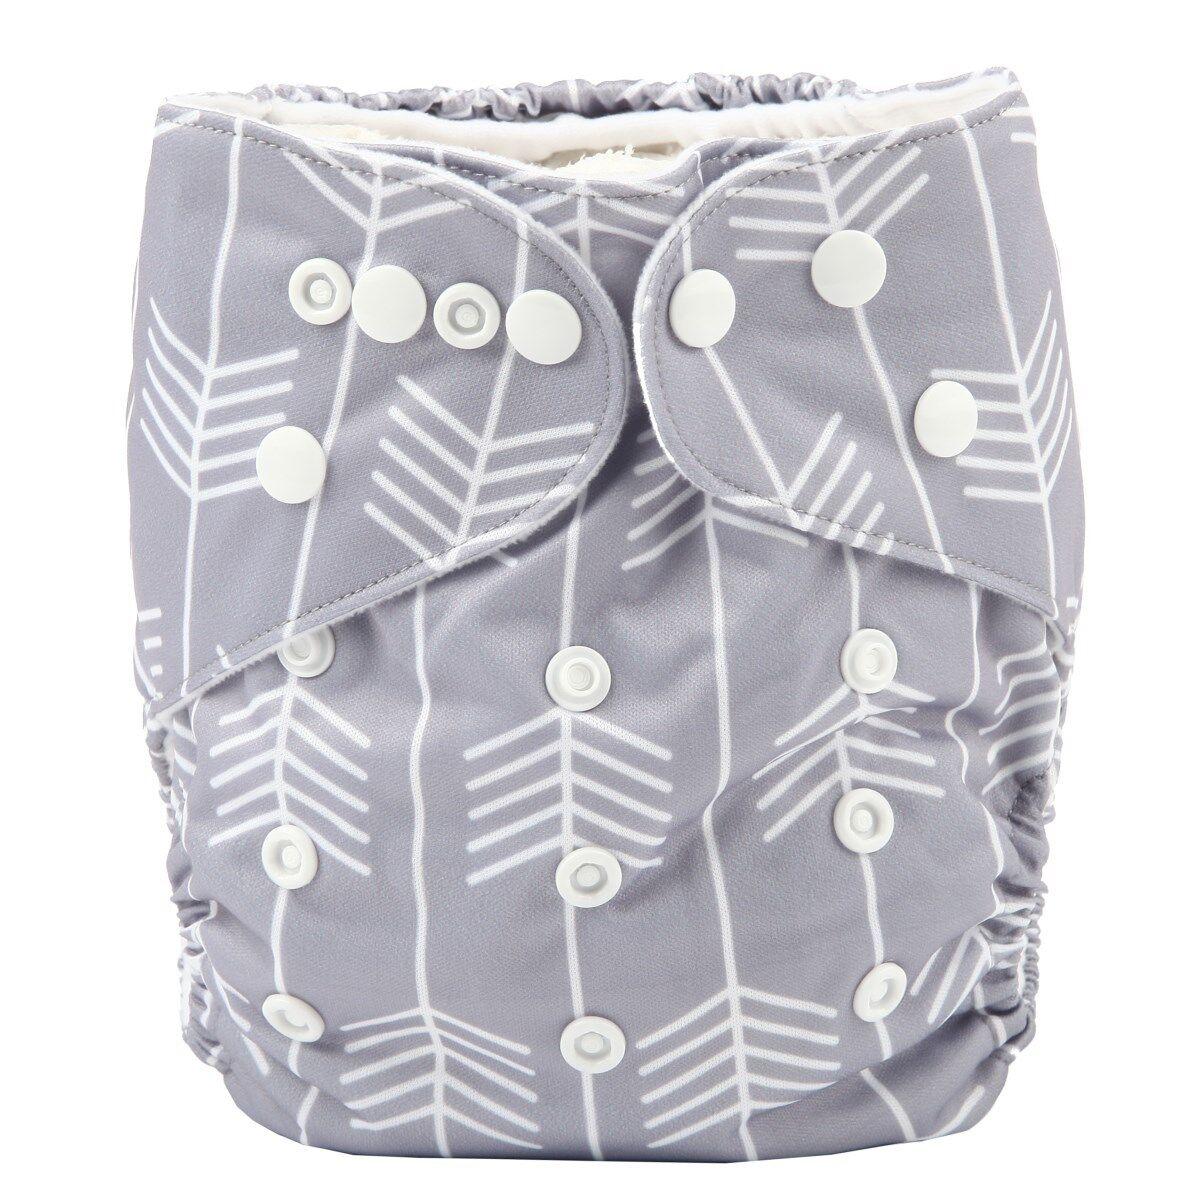 2017 new Baby Pocket Cloth Diaper Nappy Reusable Washable Arrow